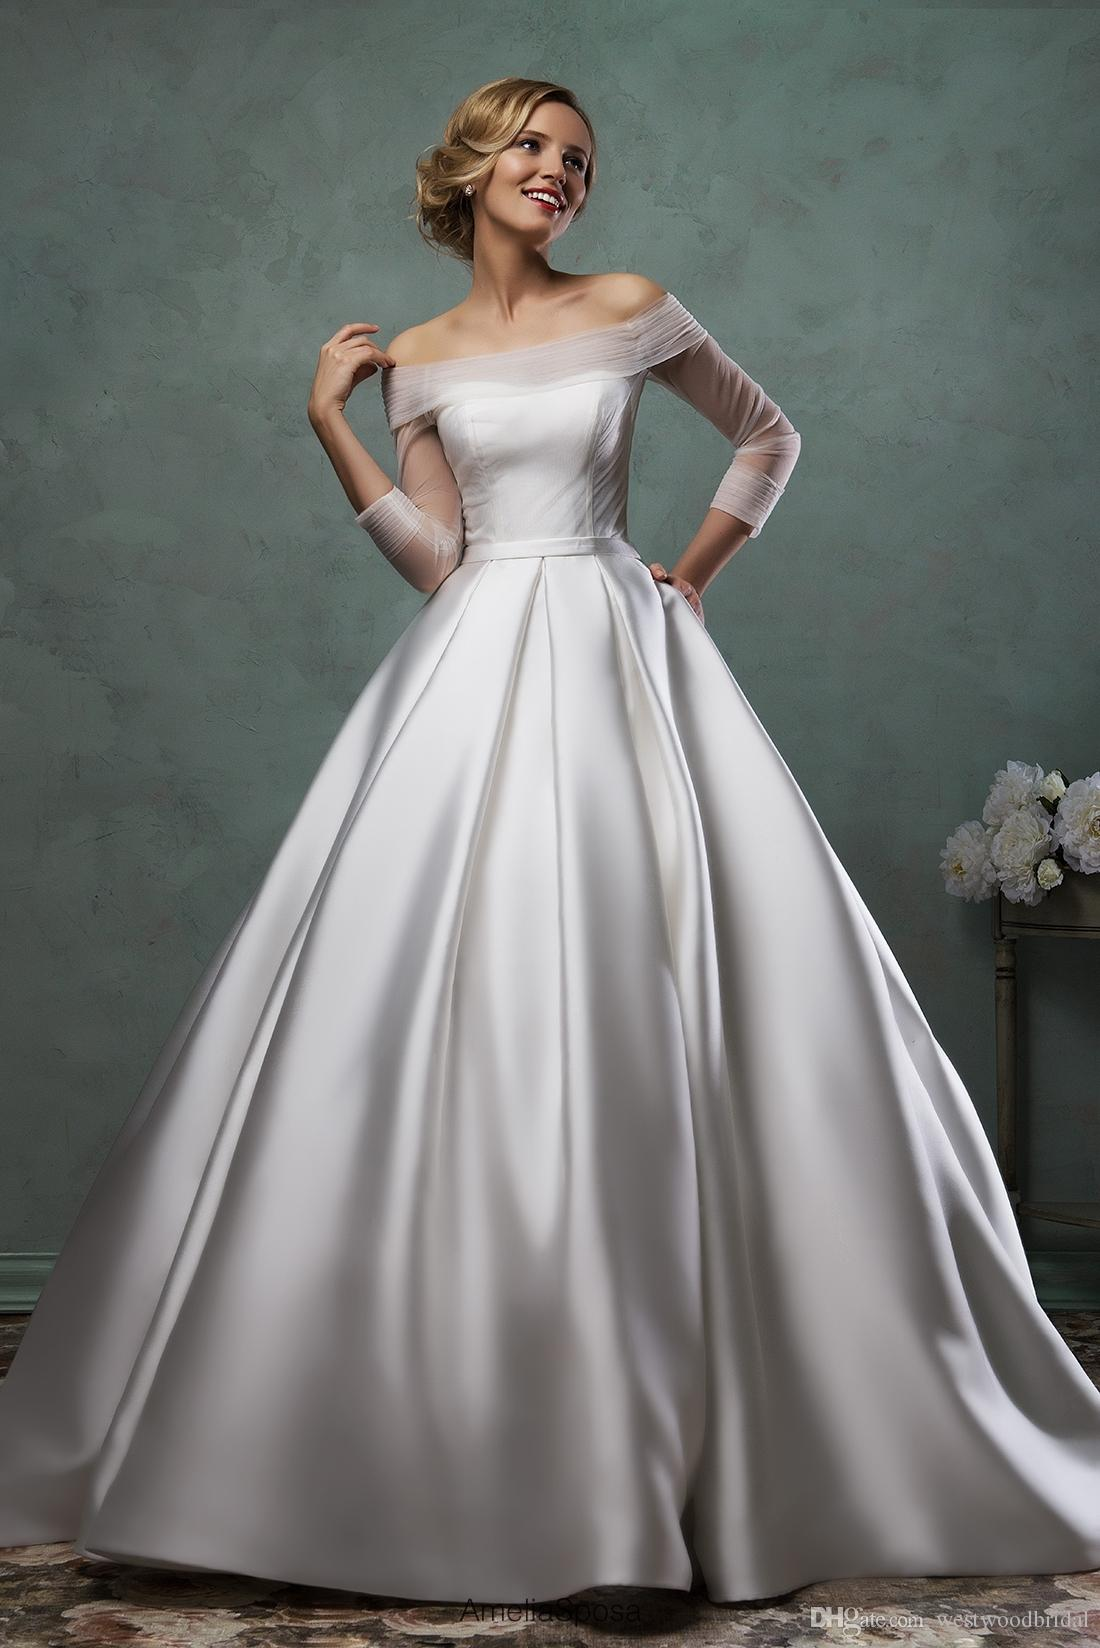 2019 Wedding Dress Amelia Sposa Paoliba Lace Ball Gown Wedding Dresses Bridal Gowns Vestido De Novia Satin Buttons off Shoulder Long Sleeve